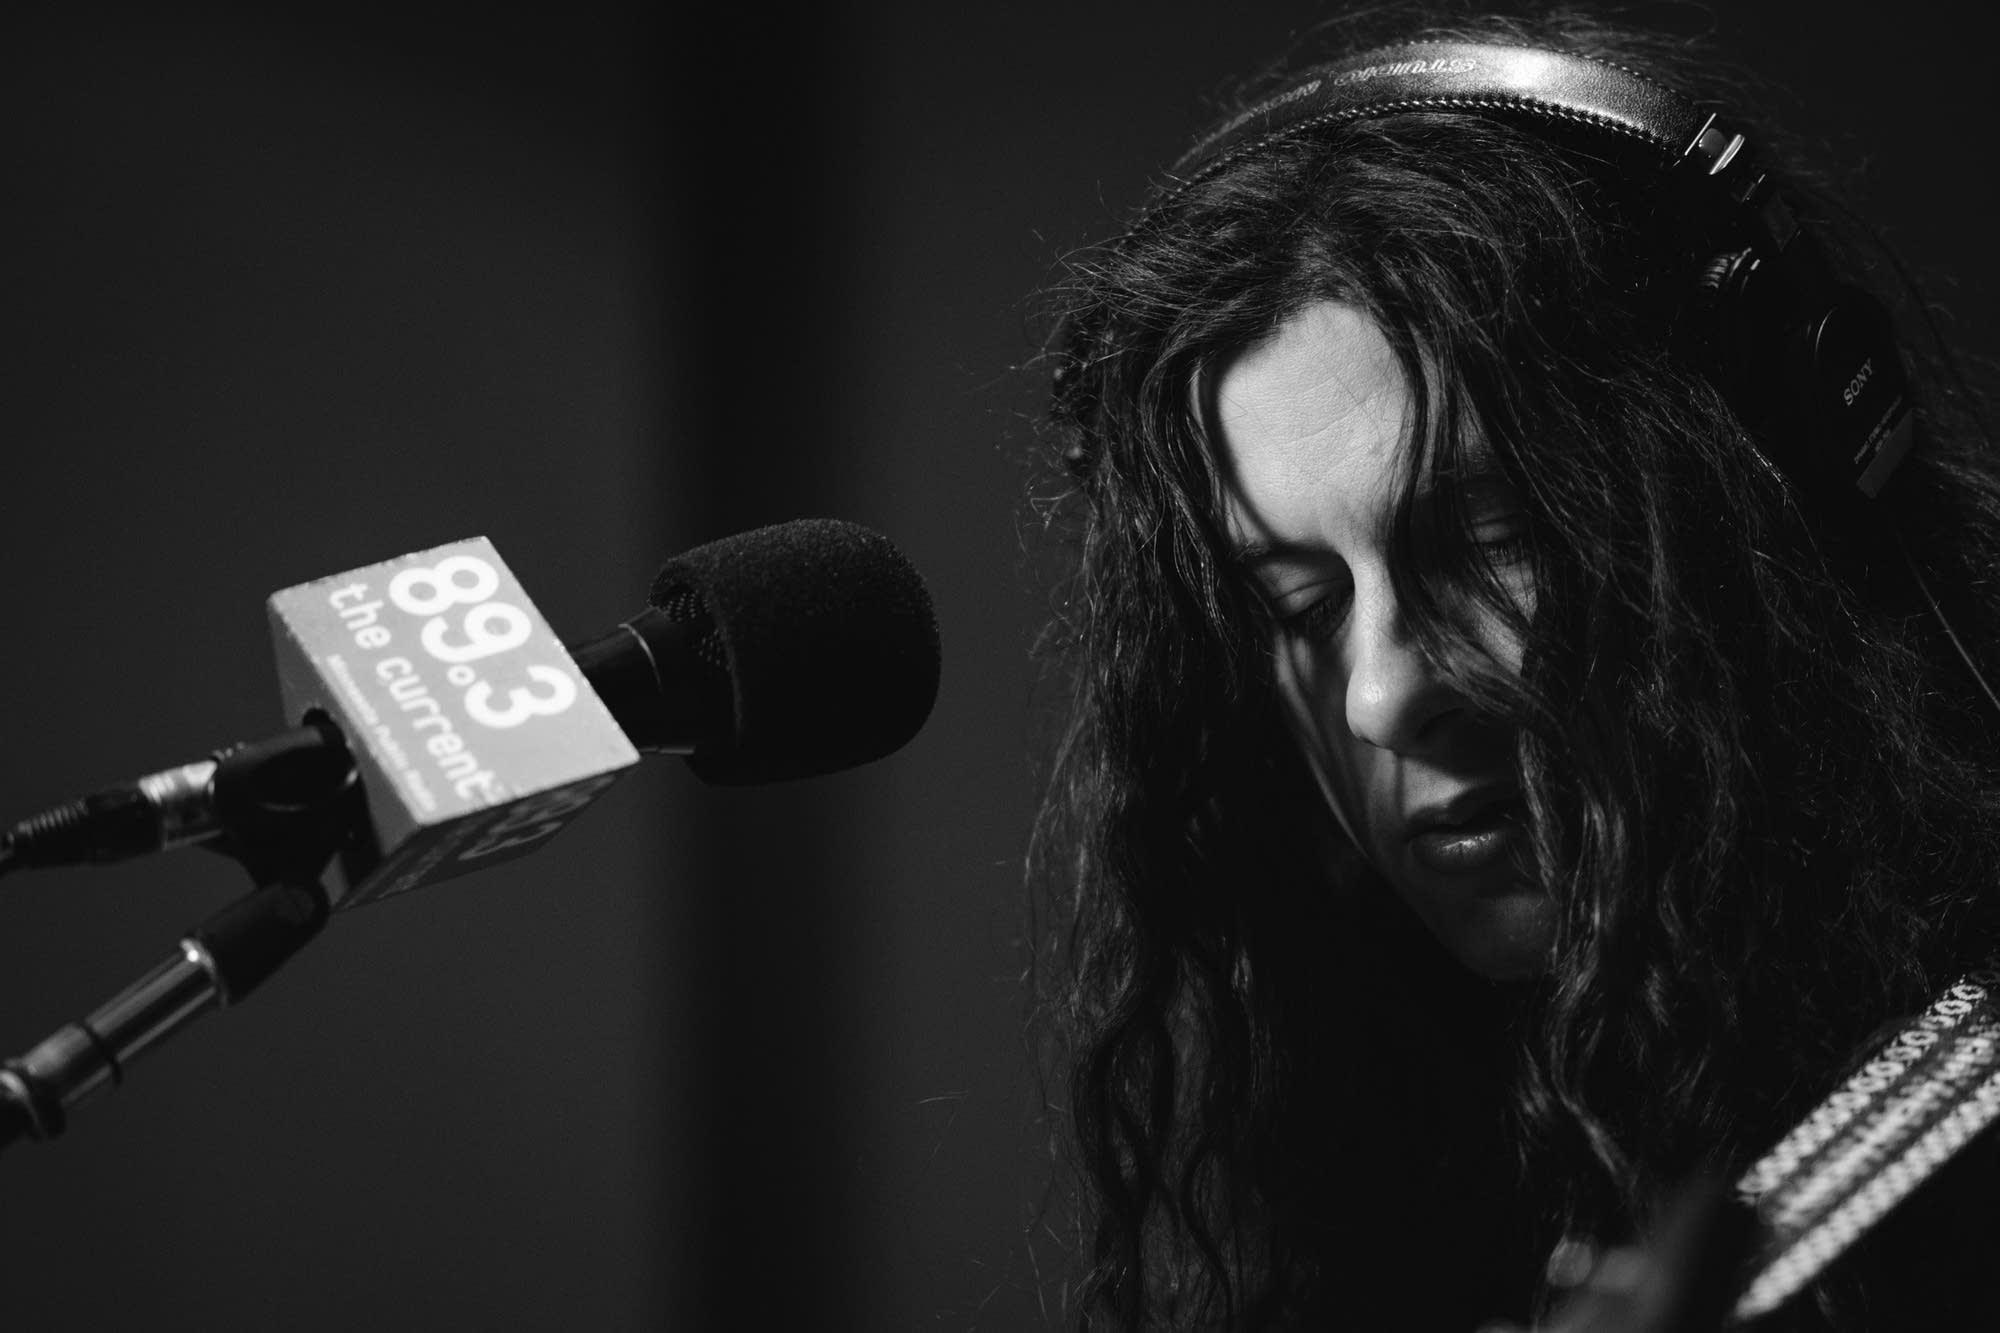 Kurt Vile performs in The Current studio